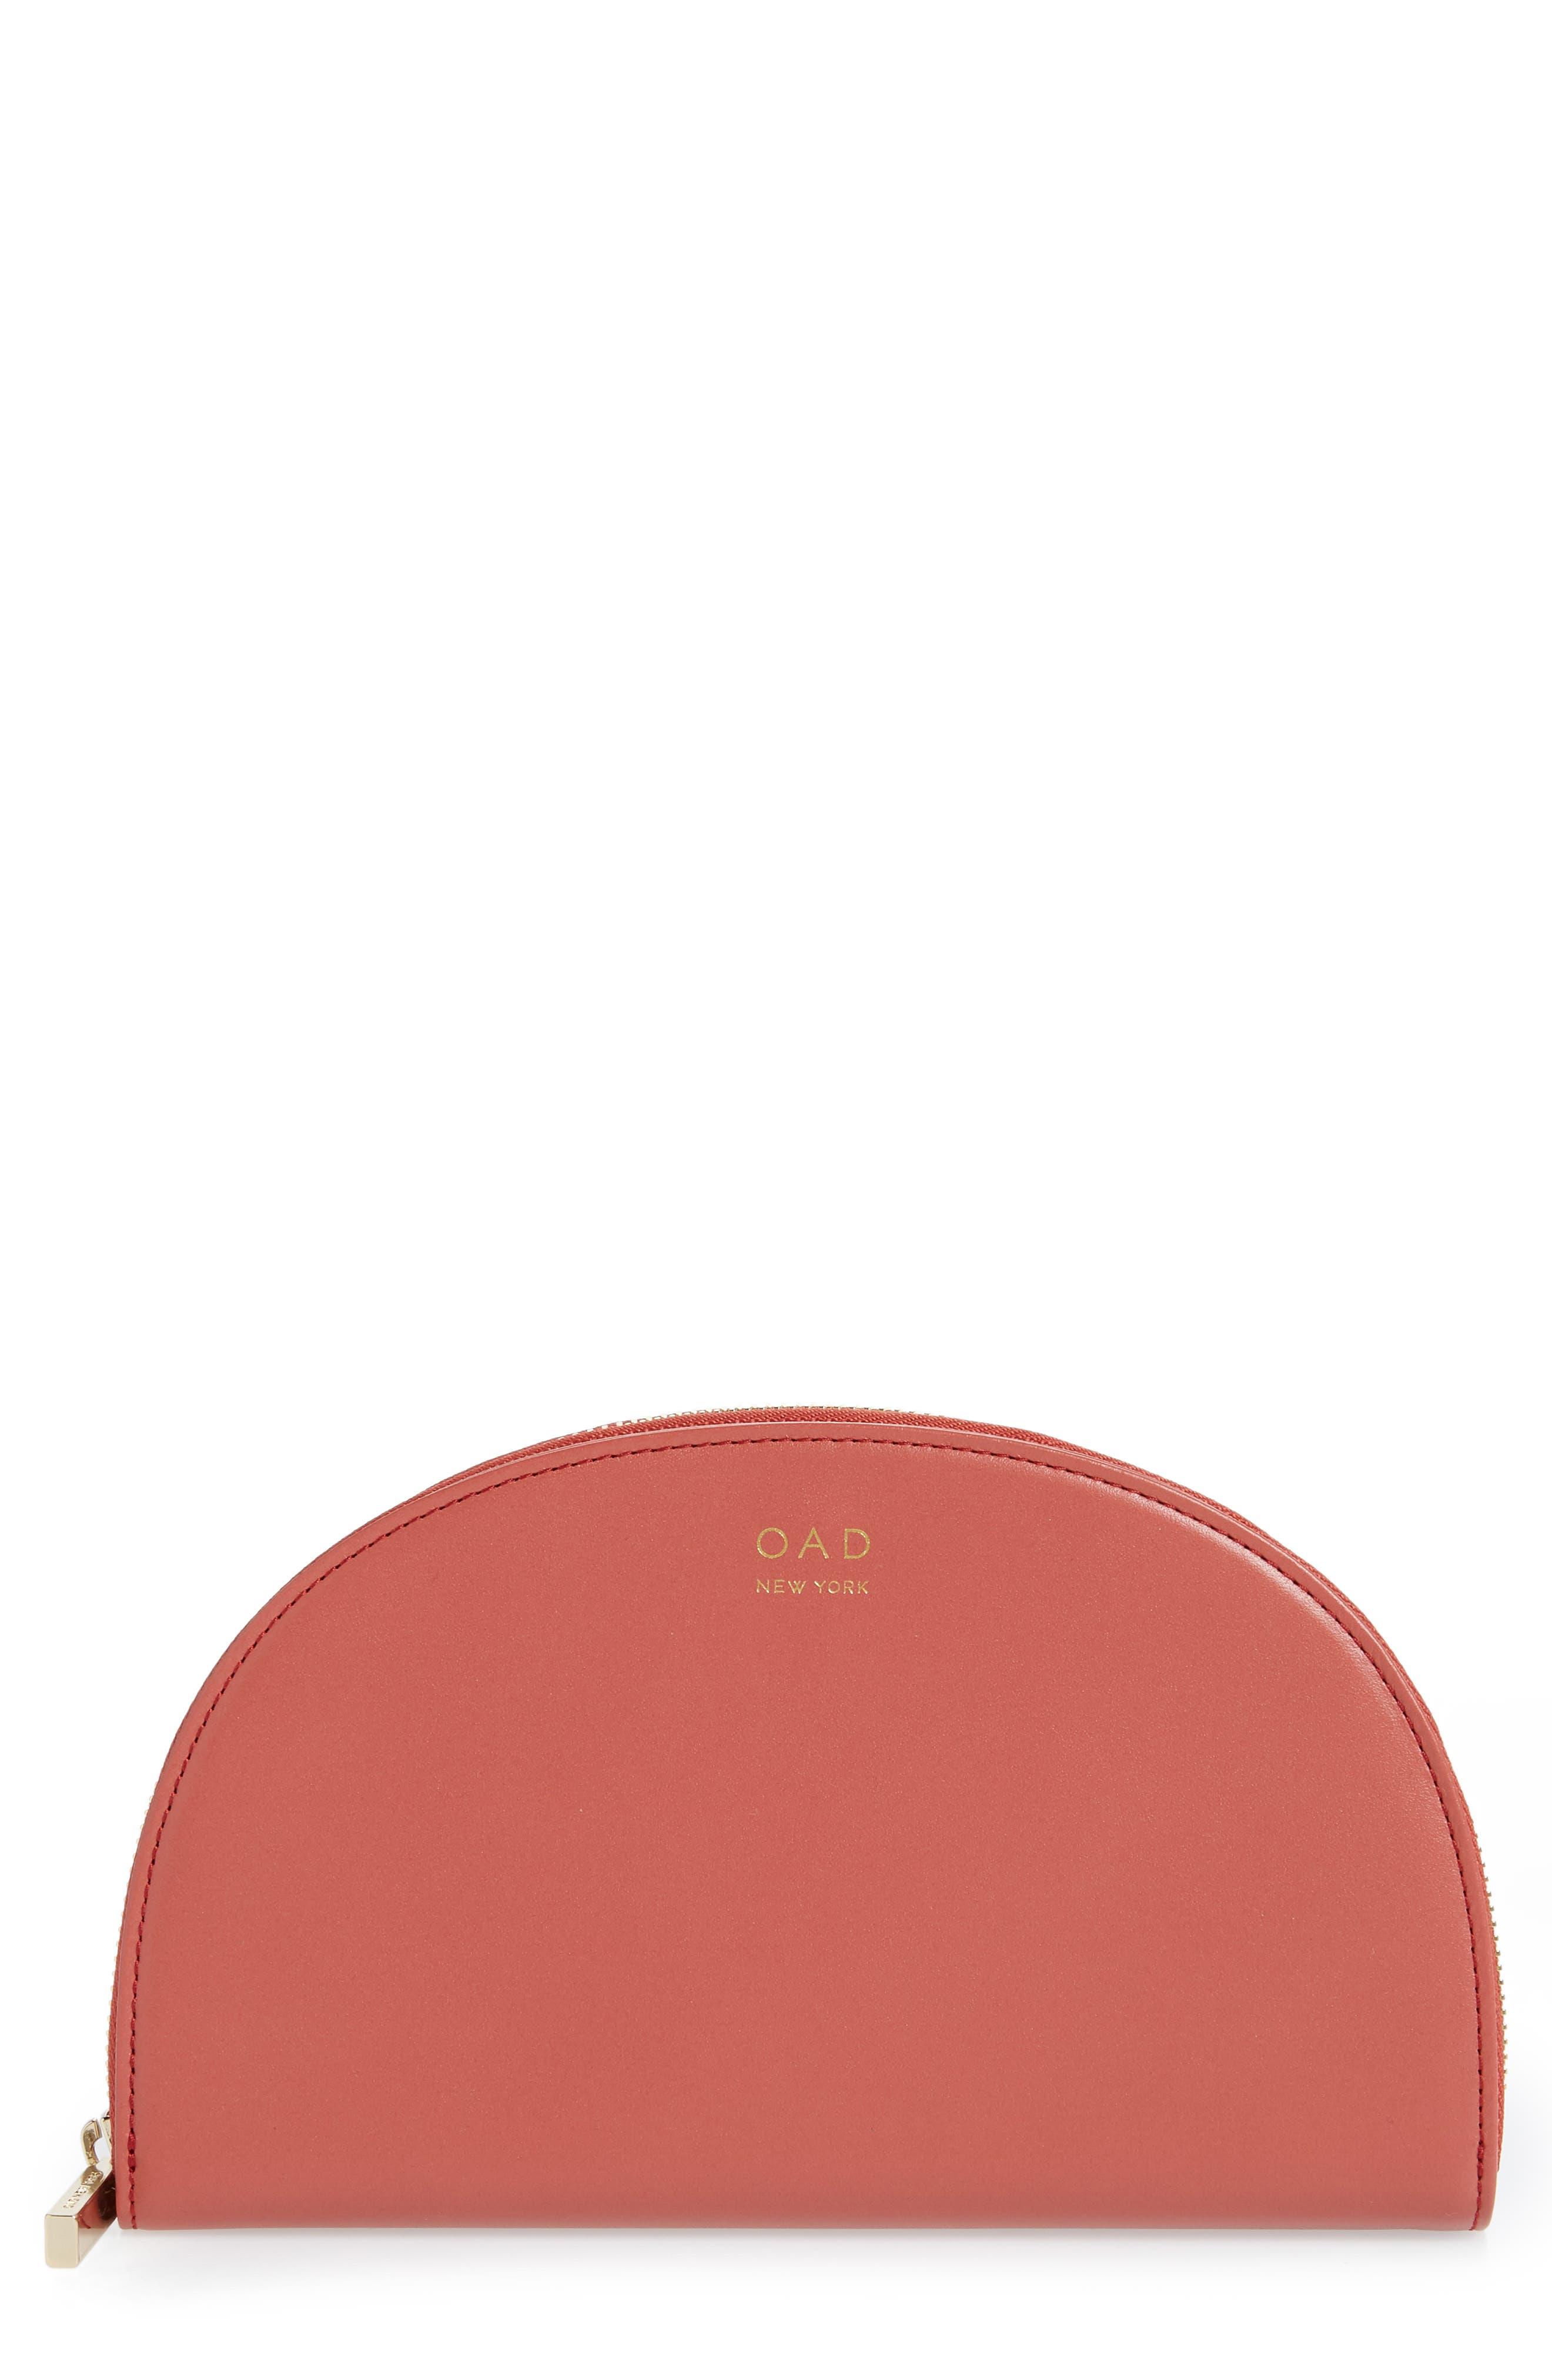 Dia Continental Mirror Wallet,                         Main,                         color, ROSE WOOD